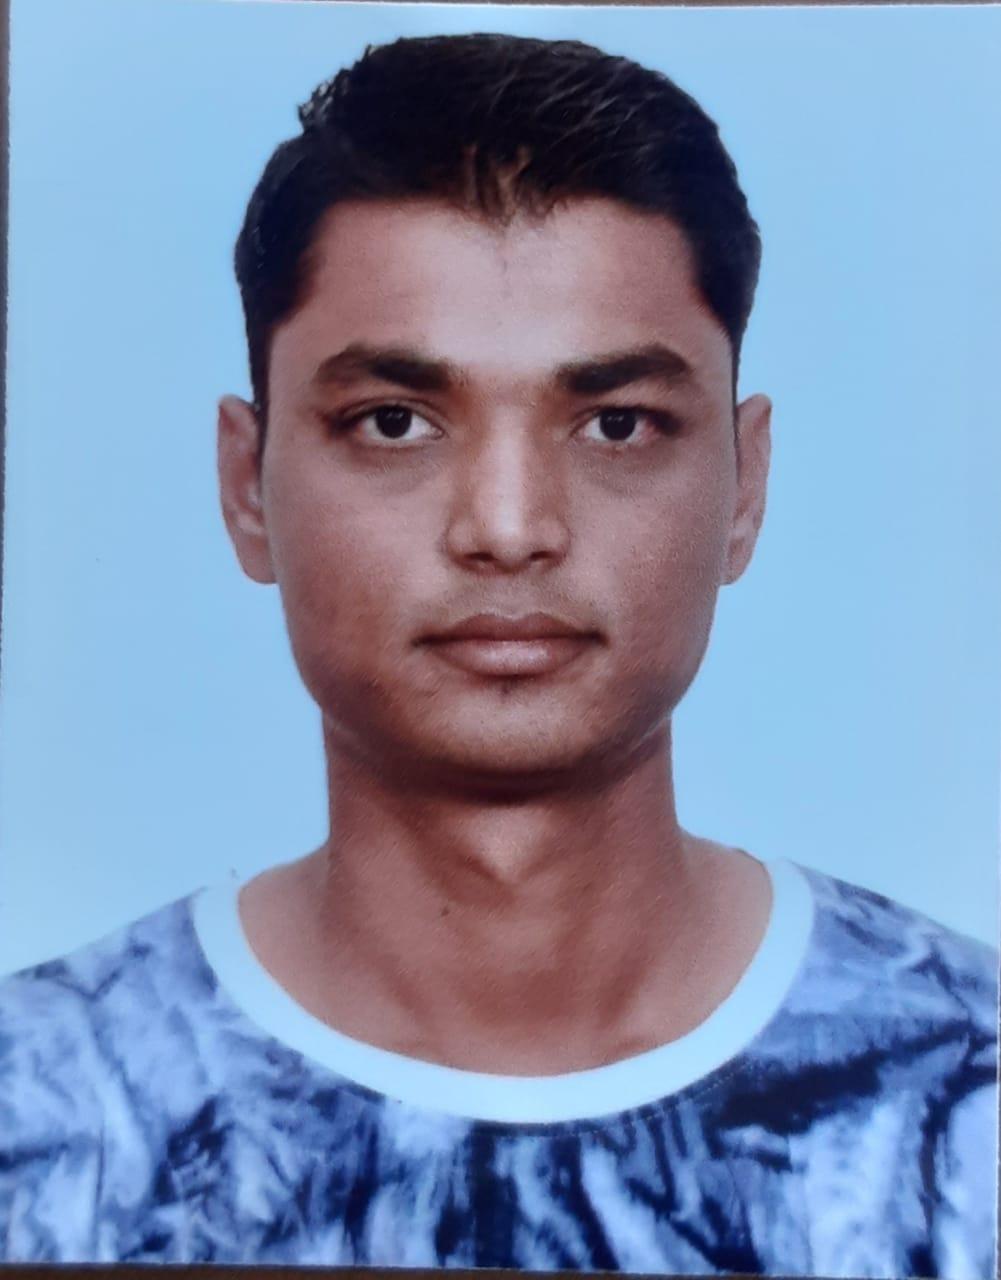 Mr. Neel Patel